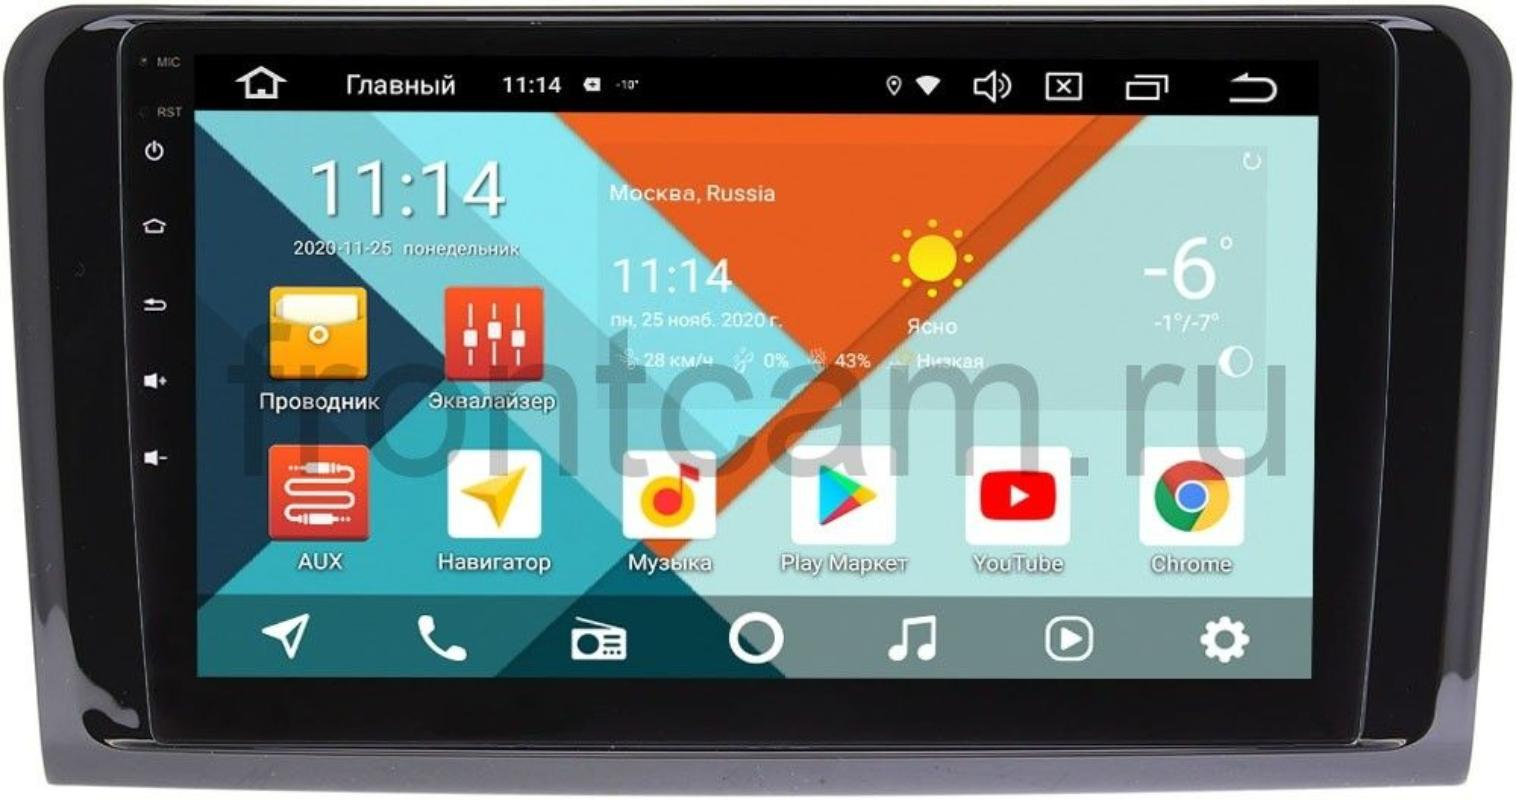 Штатная магнитола Mercedes GL-klasse (X164) 2006-2012, ML-klasse (W164) 2005-2011 (глянец) Wide Media KS9-023QM-2/32 DSP CarPlay 4G-SIM Android 10 (+ Камера заднего вида в подарок!)